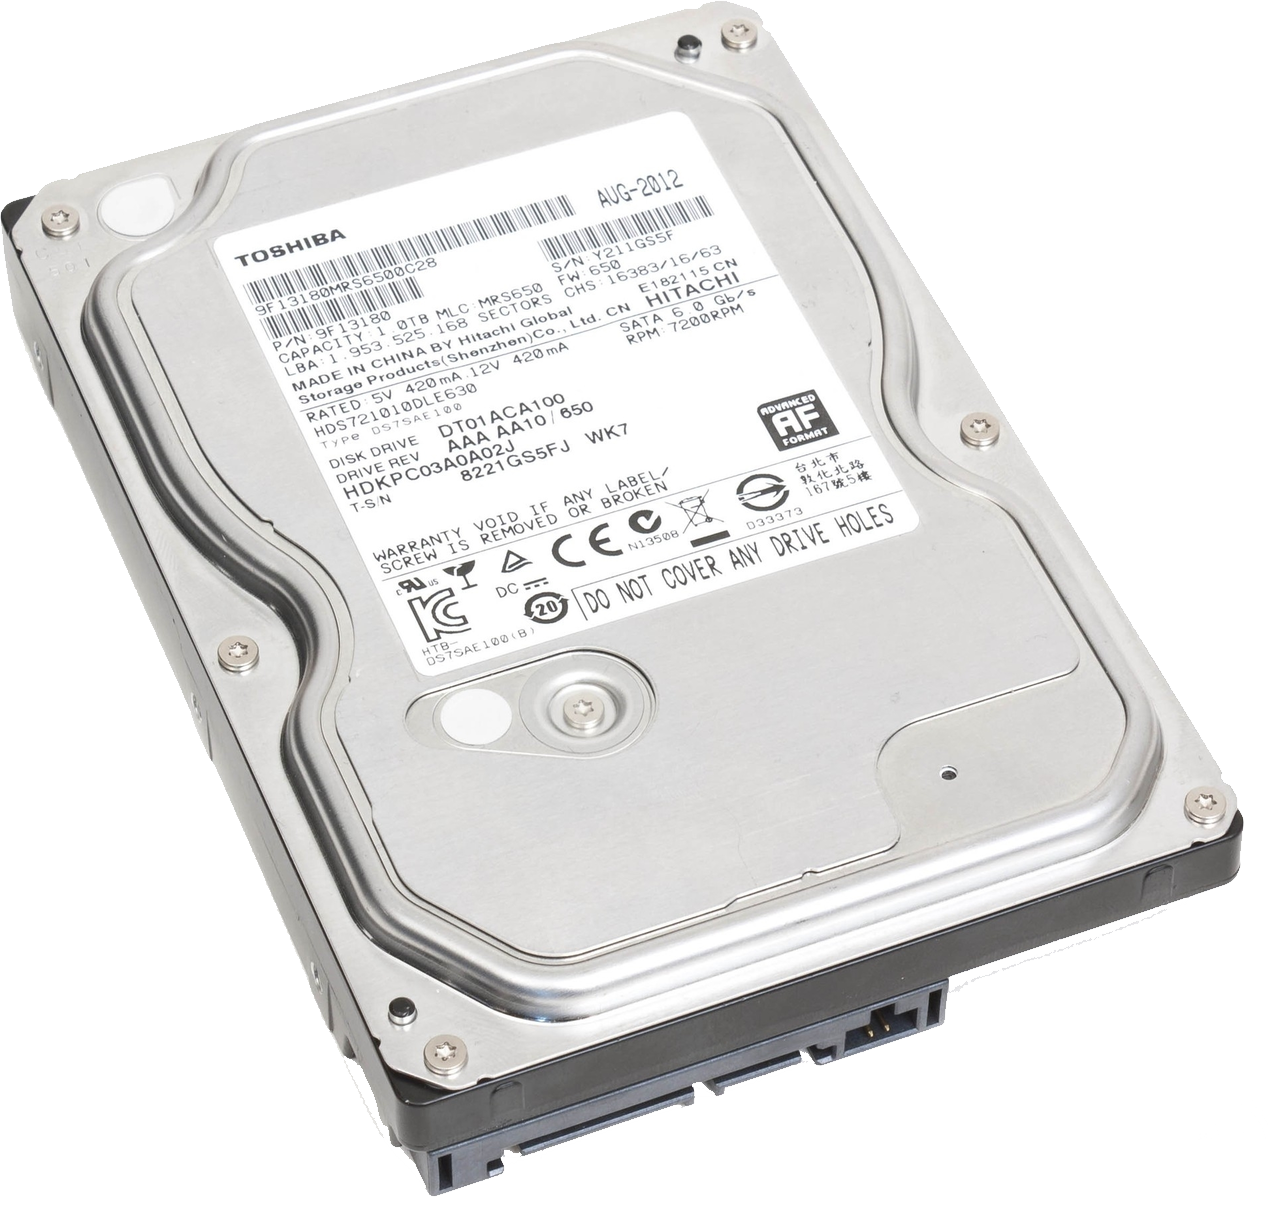 Hard Disc Transparent Image Hard Disk Toshiba Hard Disk Drive